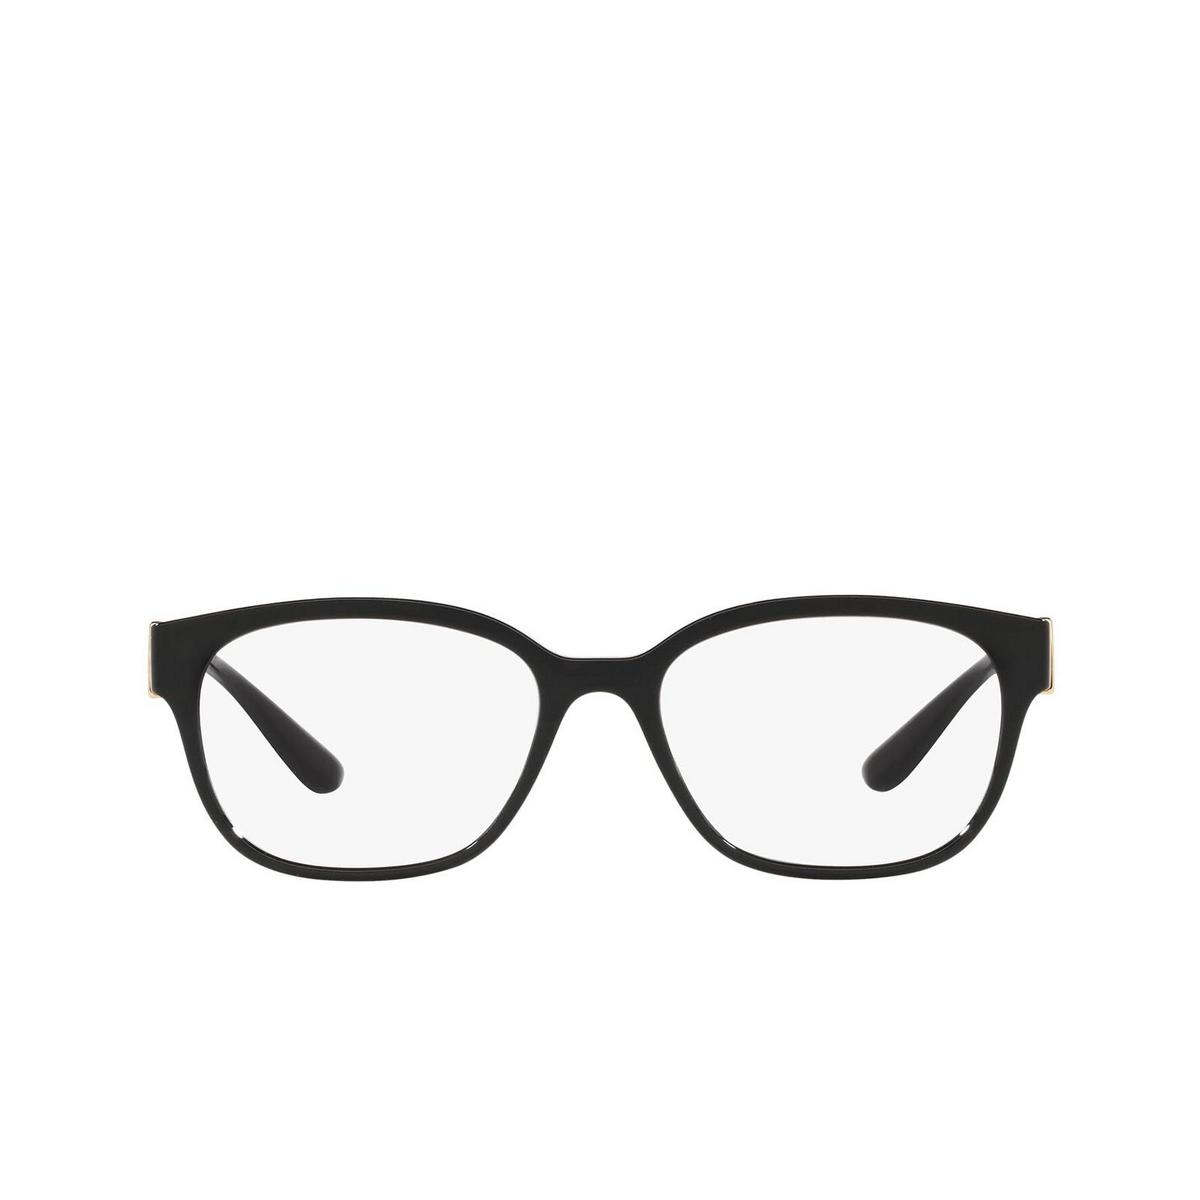 Dolce & Gabbana® Square Eyeglasses: DG5066 color Black 501 - front view.